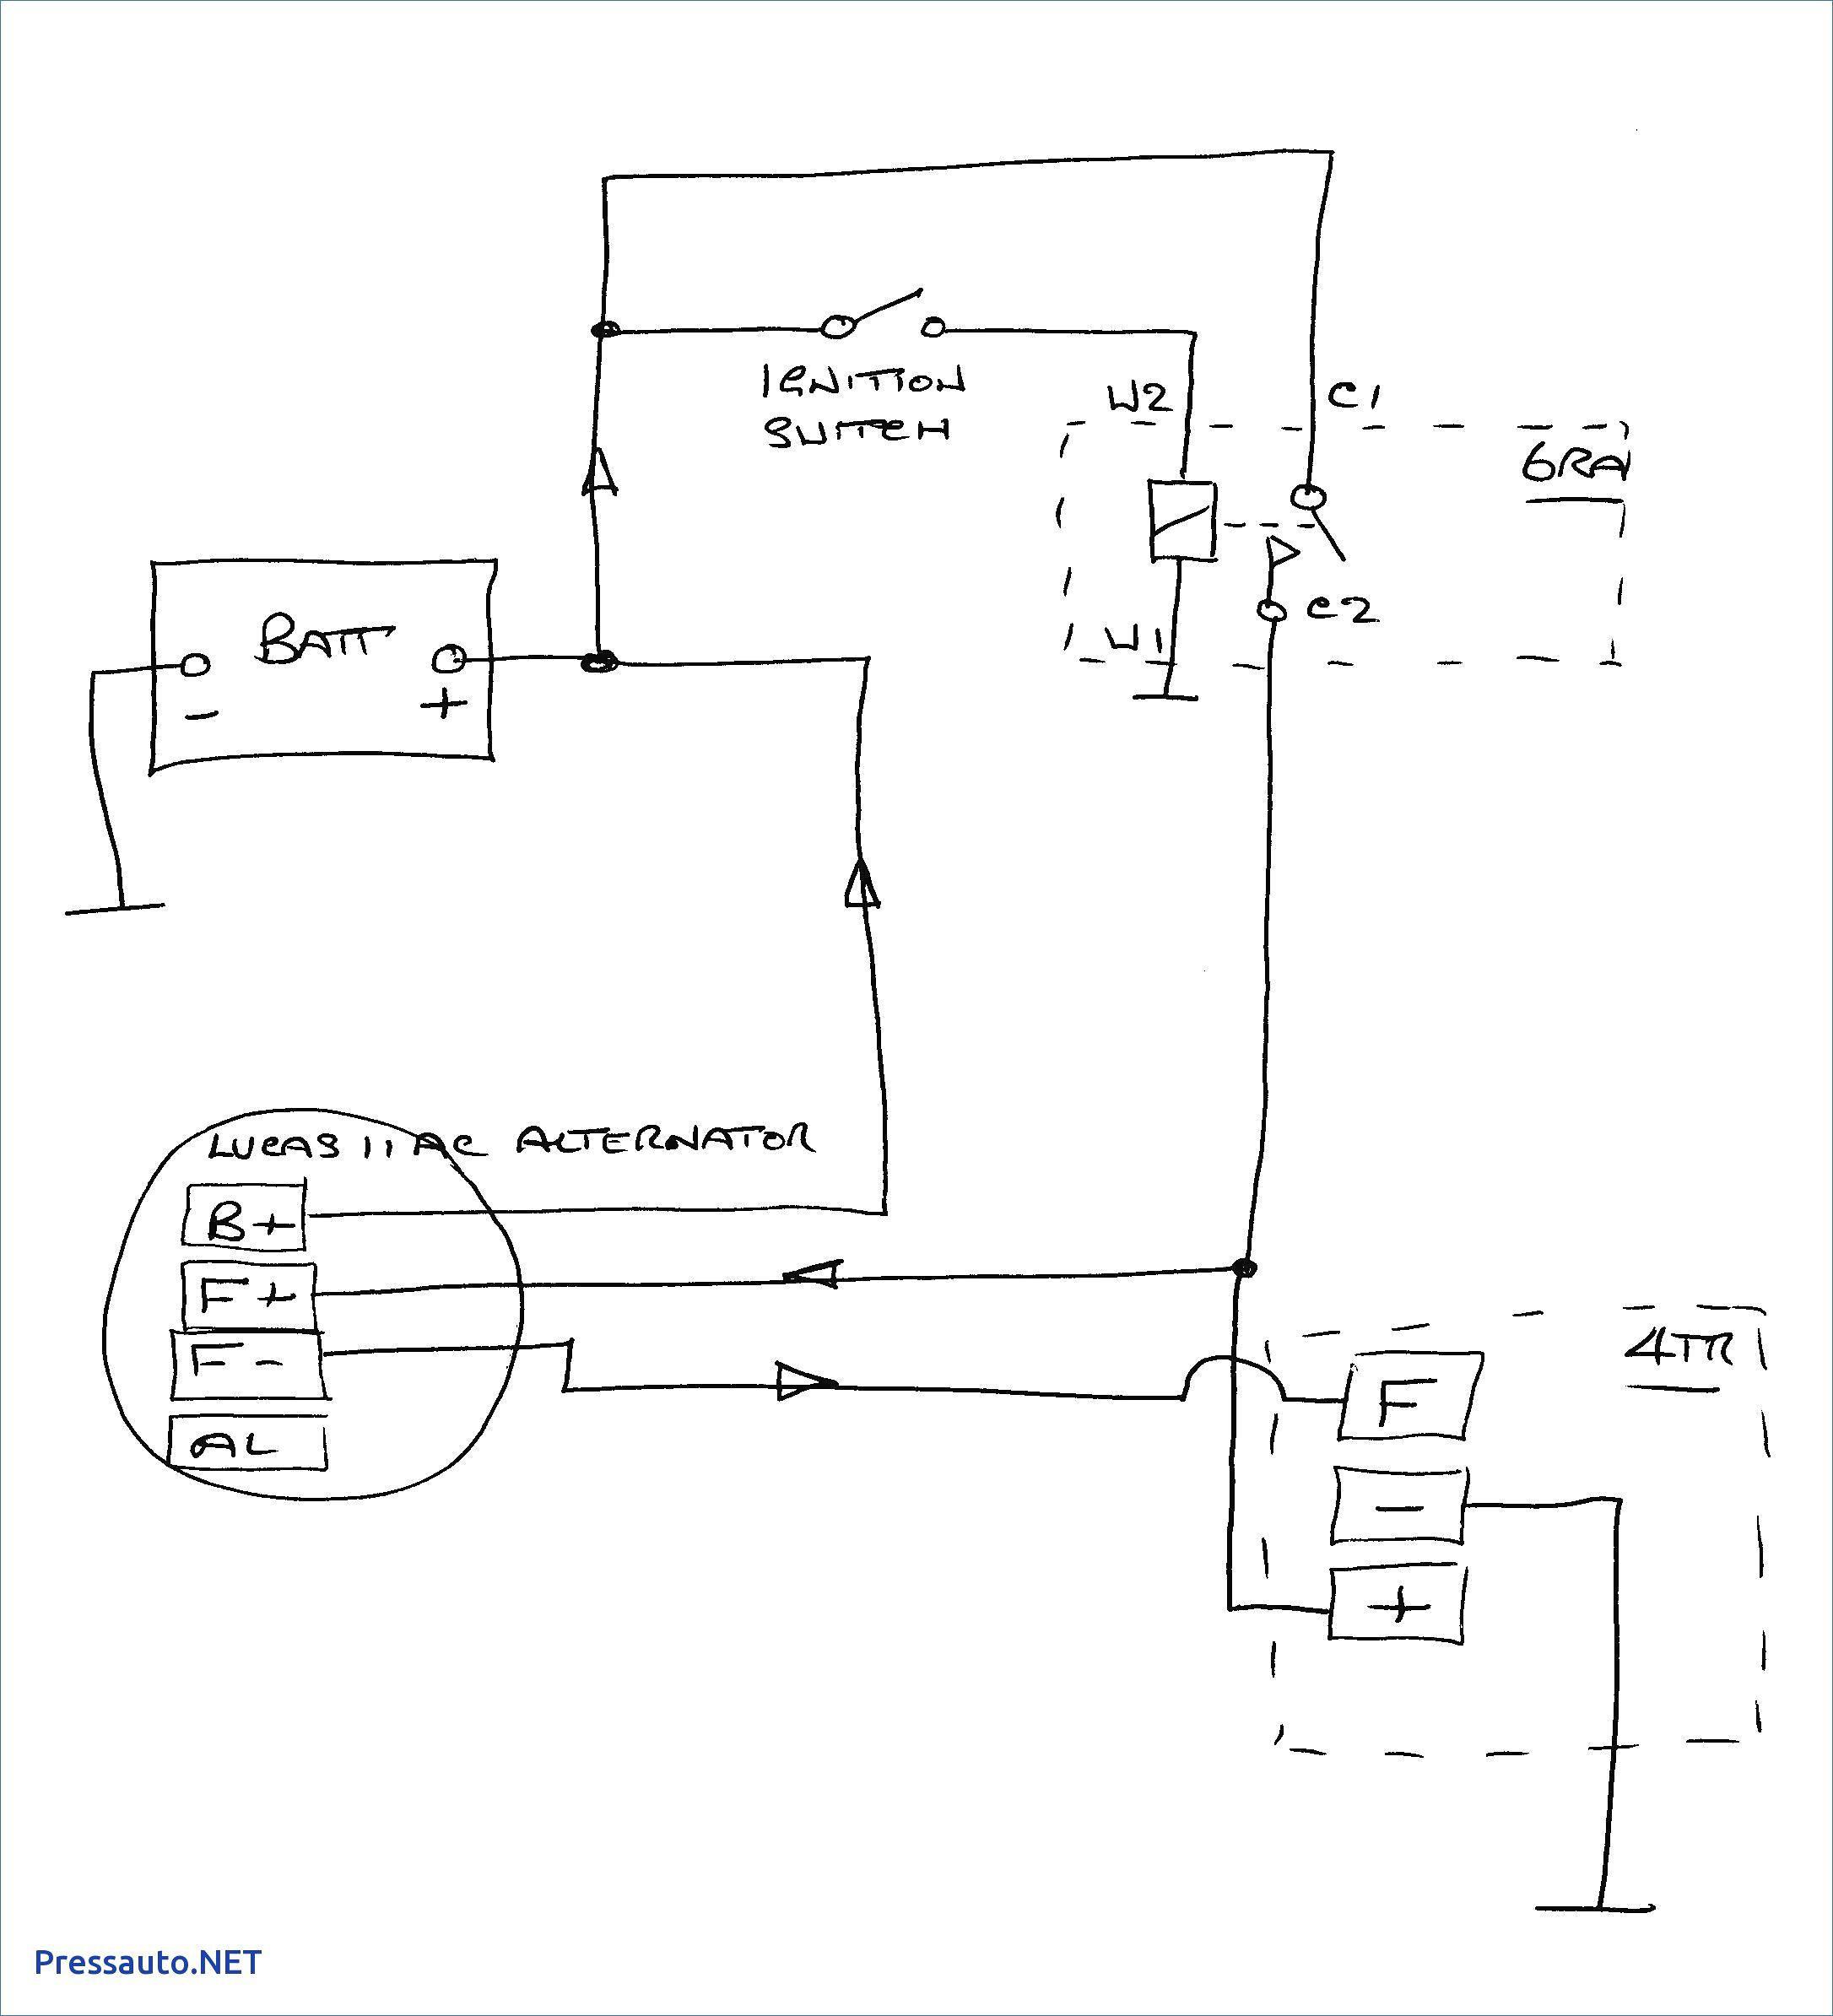 4 Wire Gm Alternator Wiring Diagram 12V   Wiring Diagram - Chevy 4 Wire Alternator Wiring Diagram